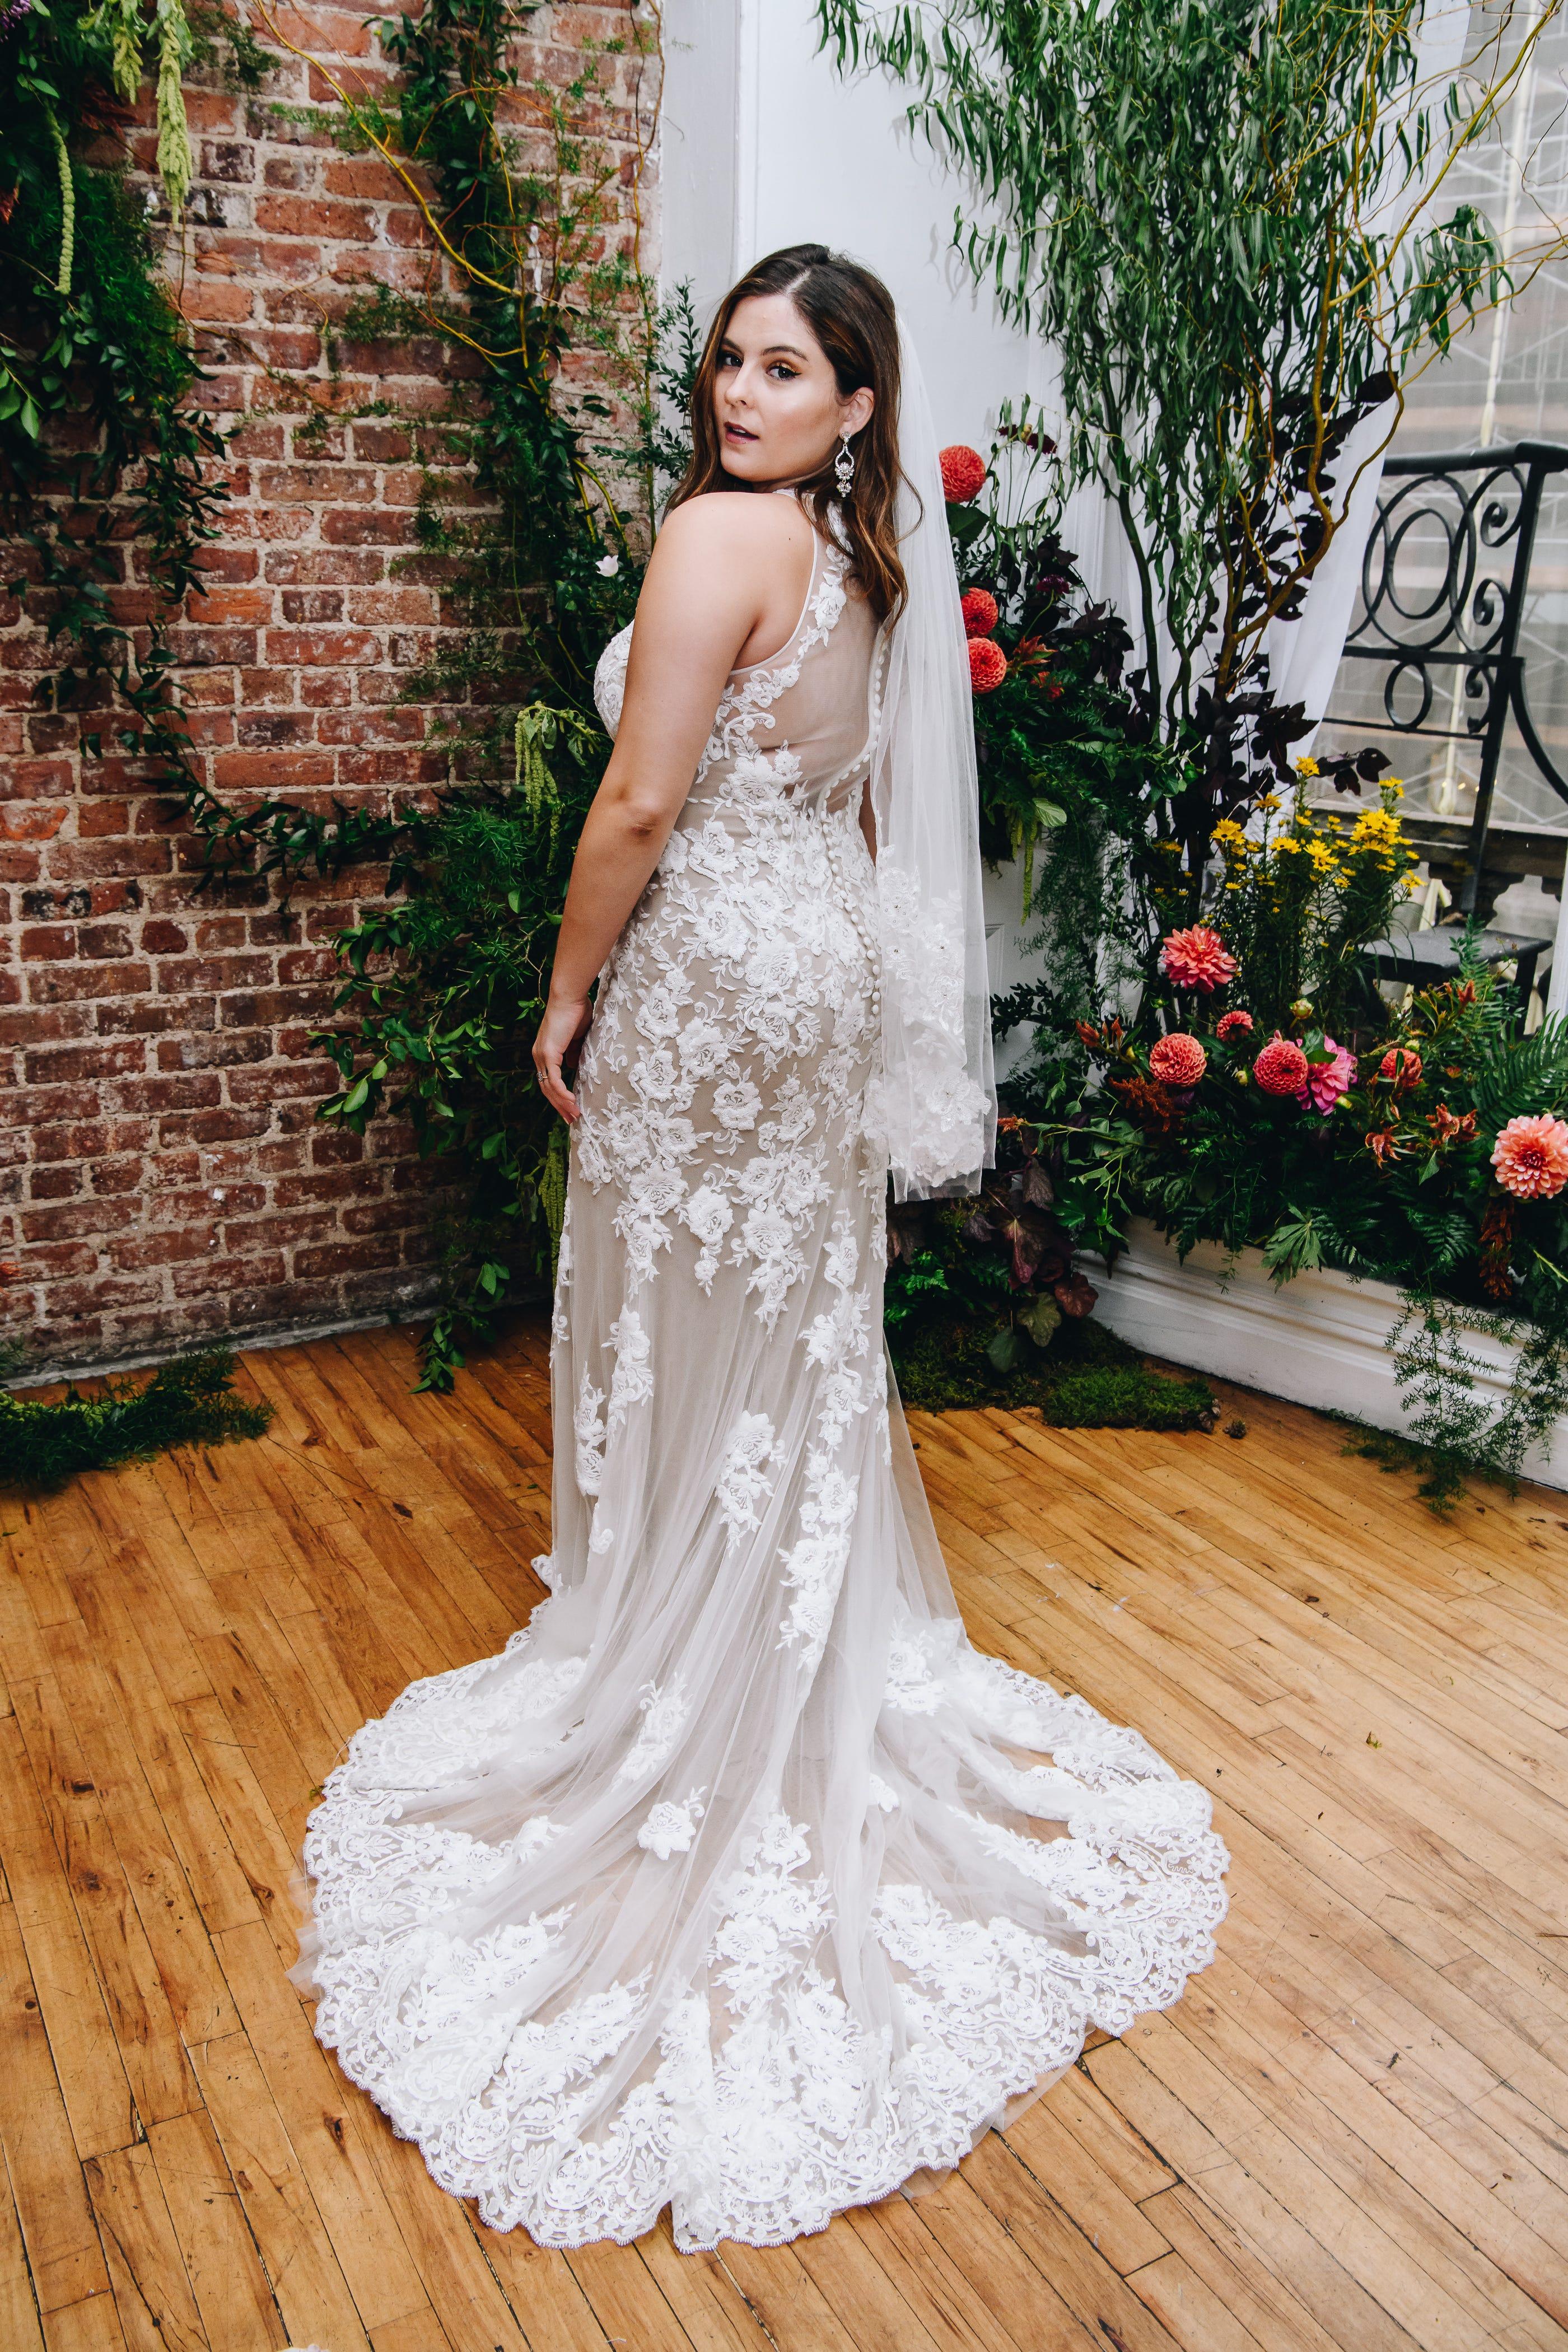 Wedding Dress Chain David S Bridal Plans Big Changes After Bankruptcy